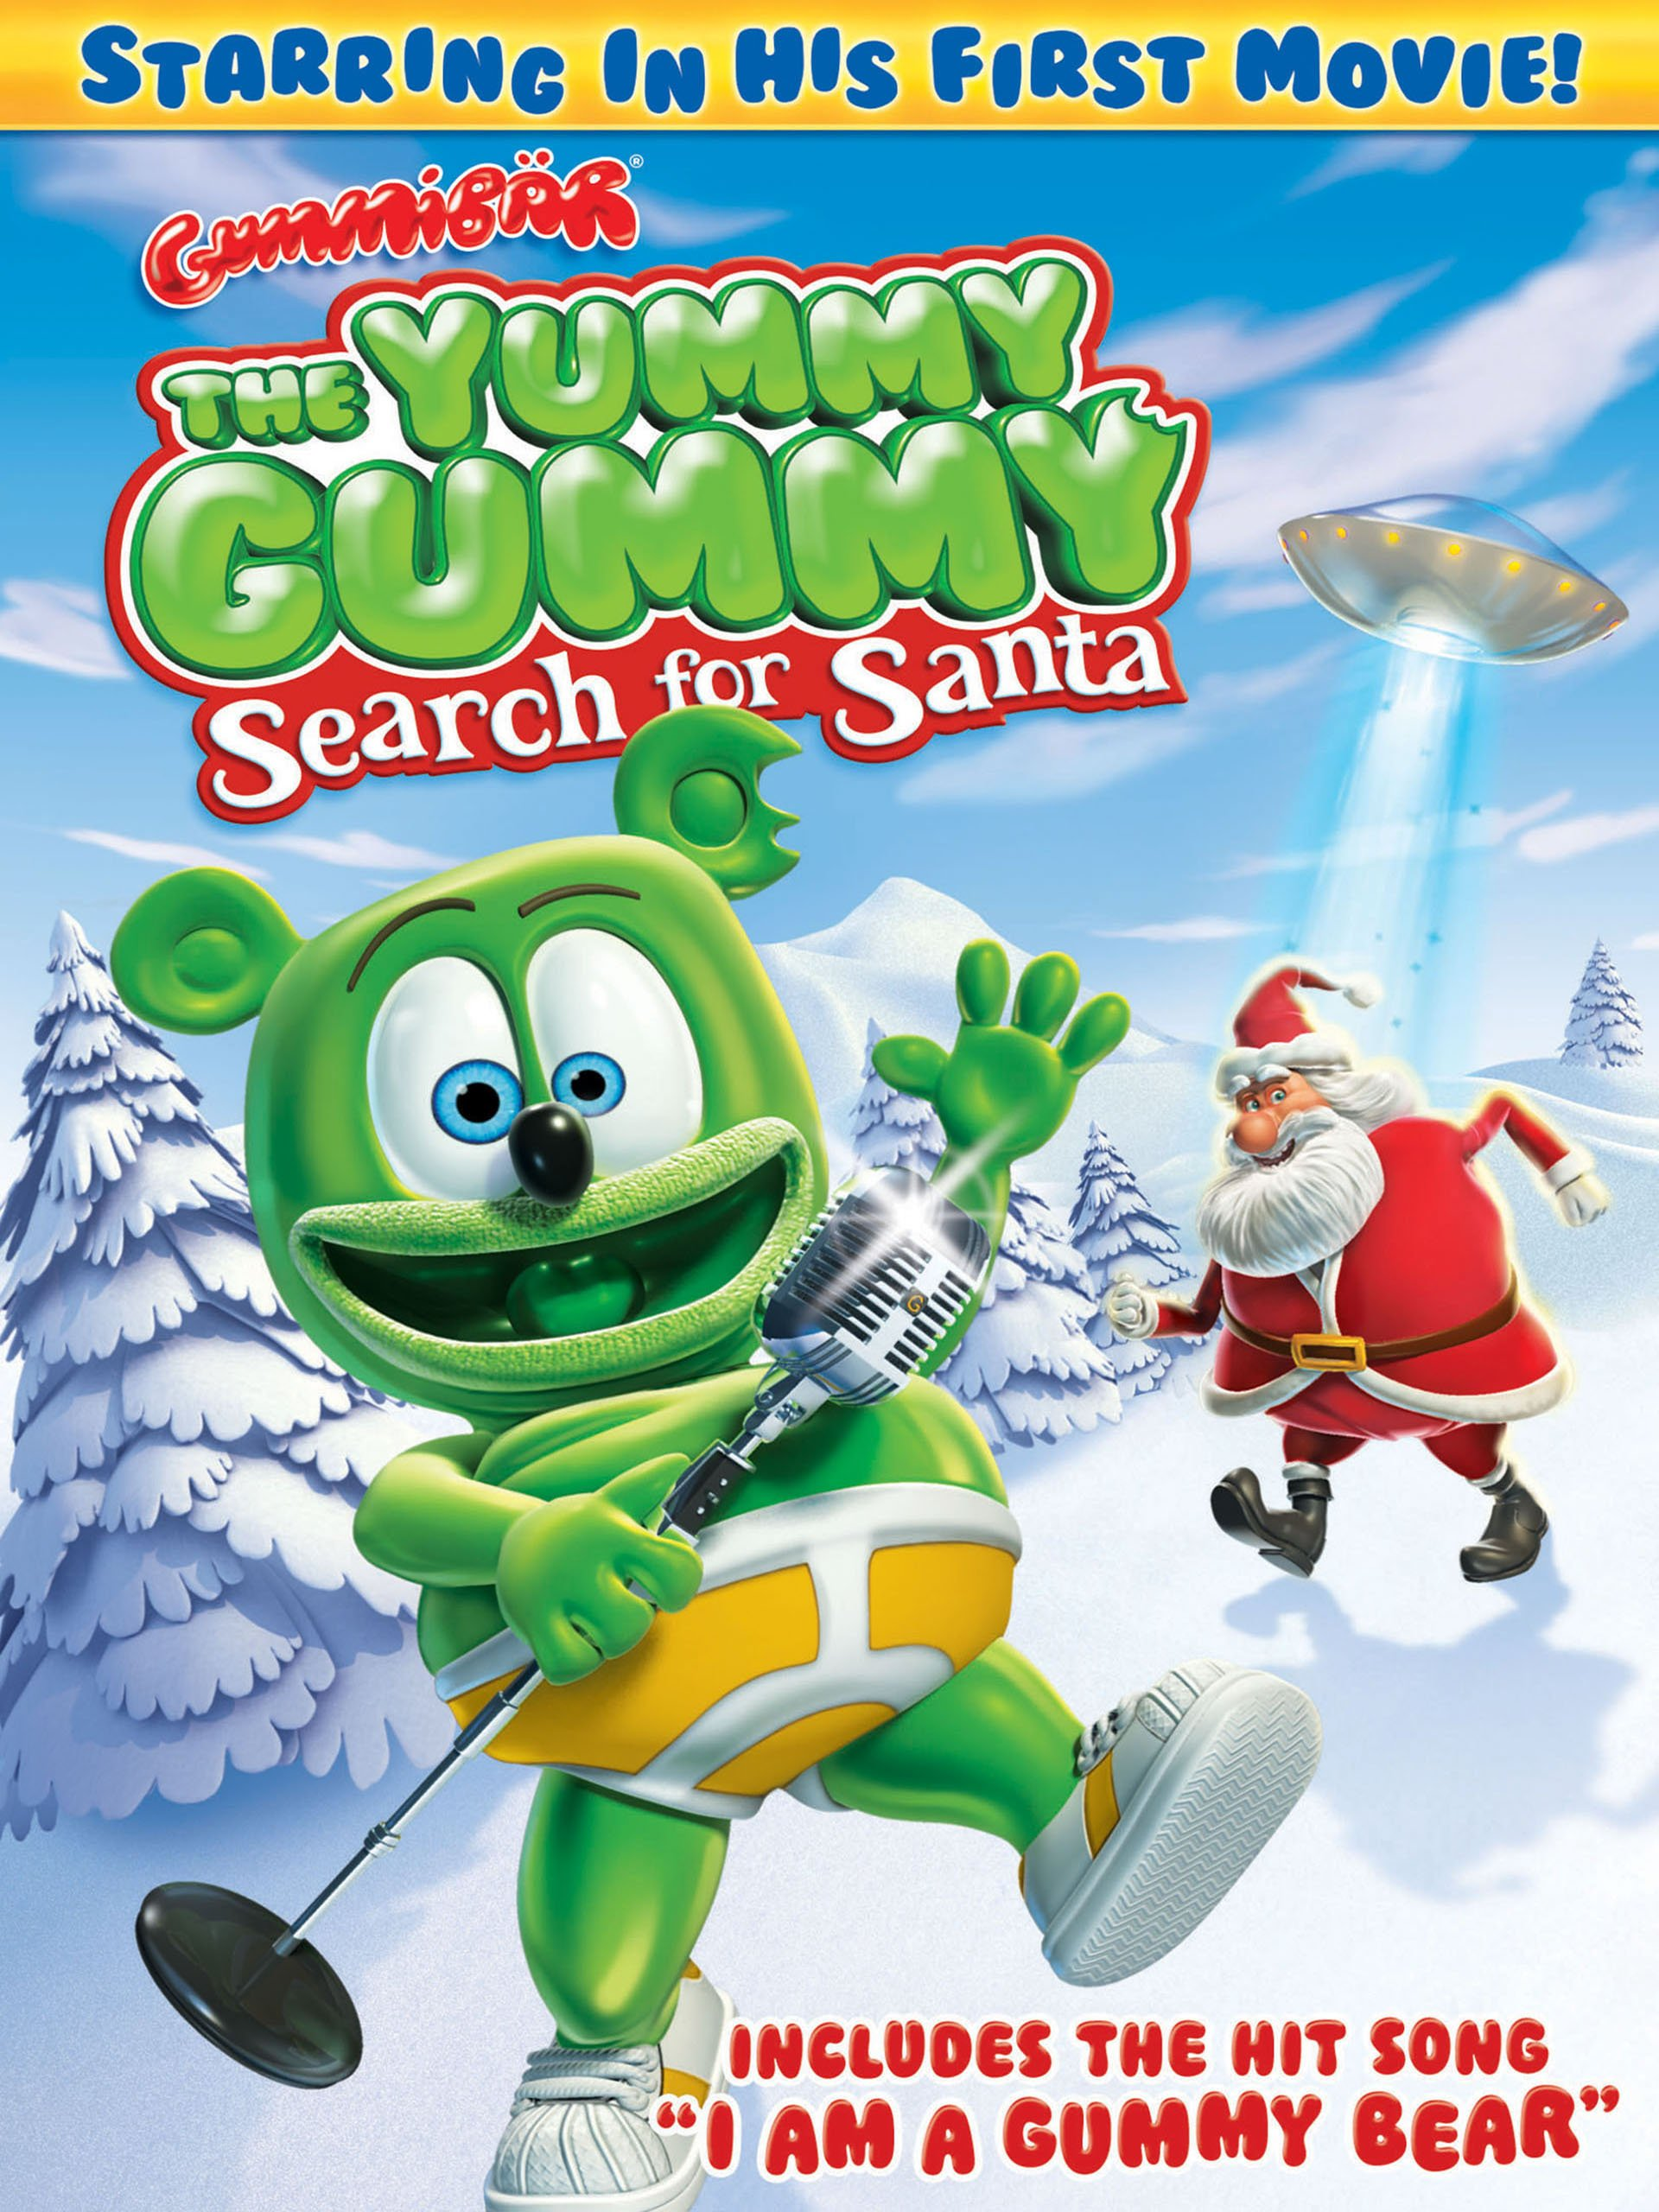 Amazon.com: Yummy Gummy Search For Santa: The Movie: Gummibar, Kala, Vam Piro, Harry: Amazon Digital Services LLC